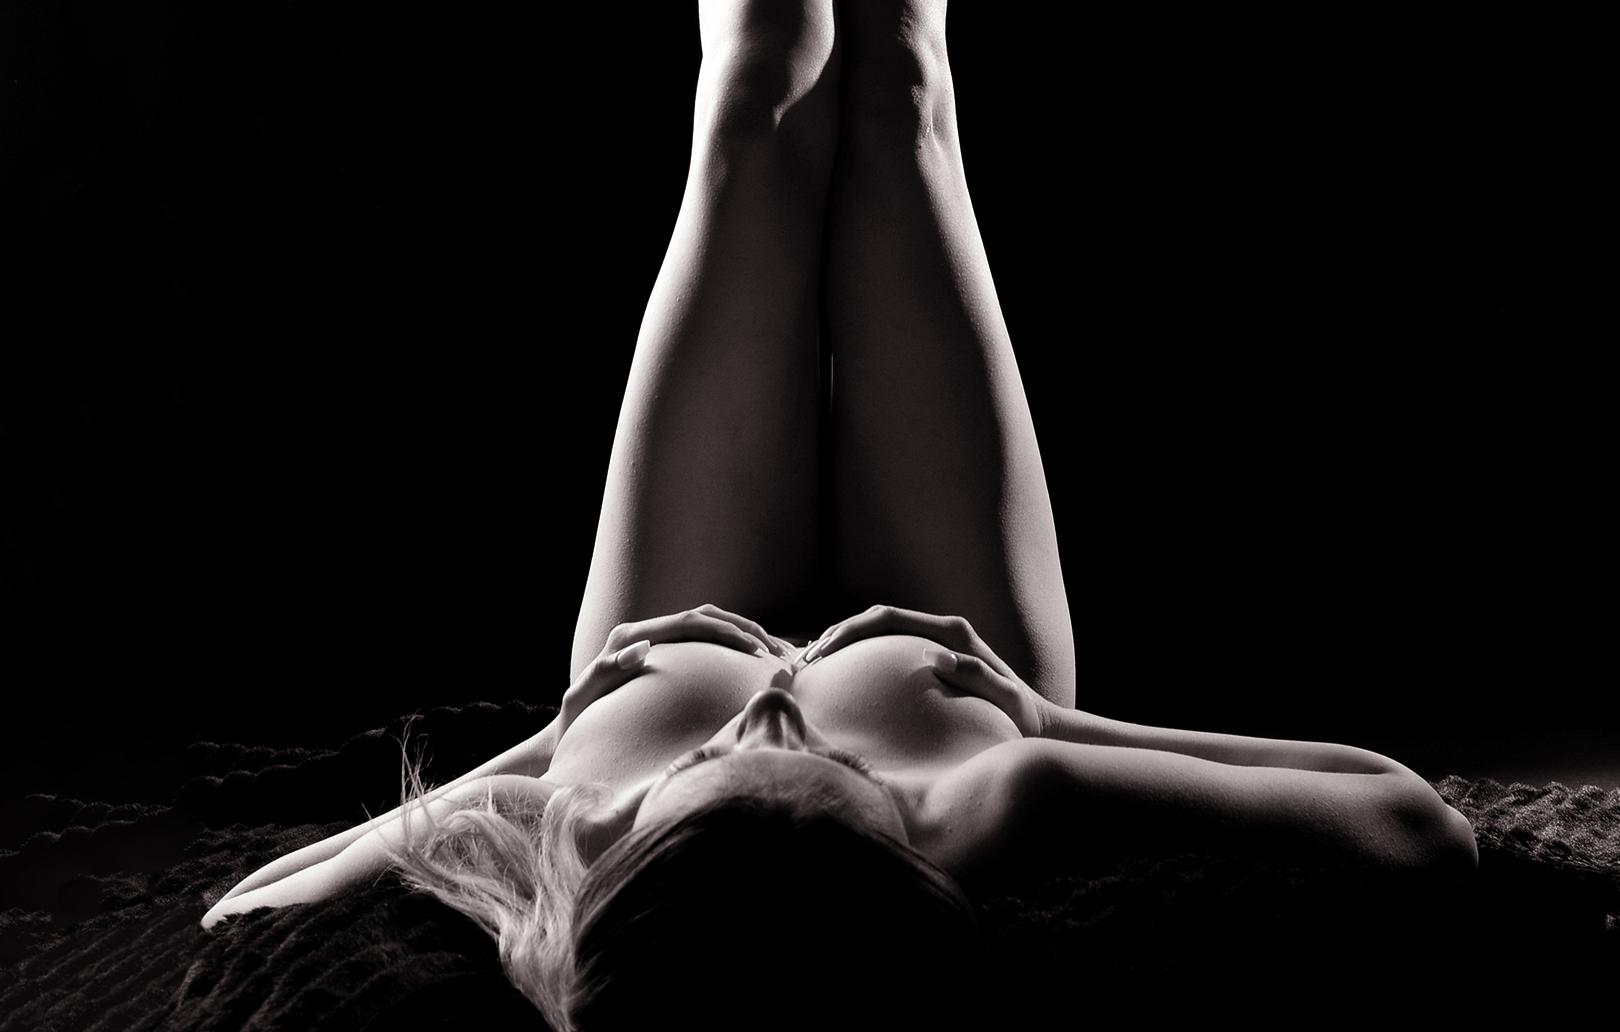 erotisches-fotoshooting-regensburg-bg11610535574